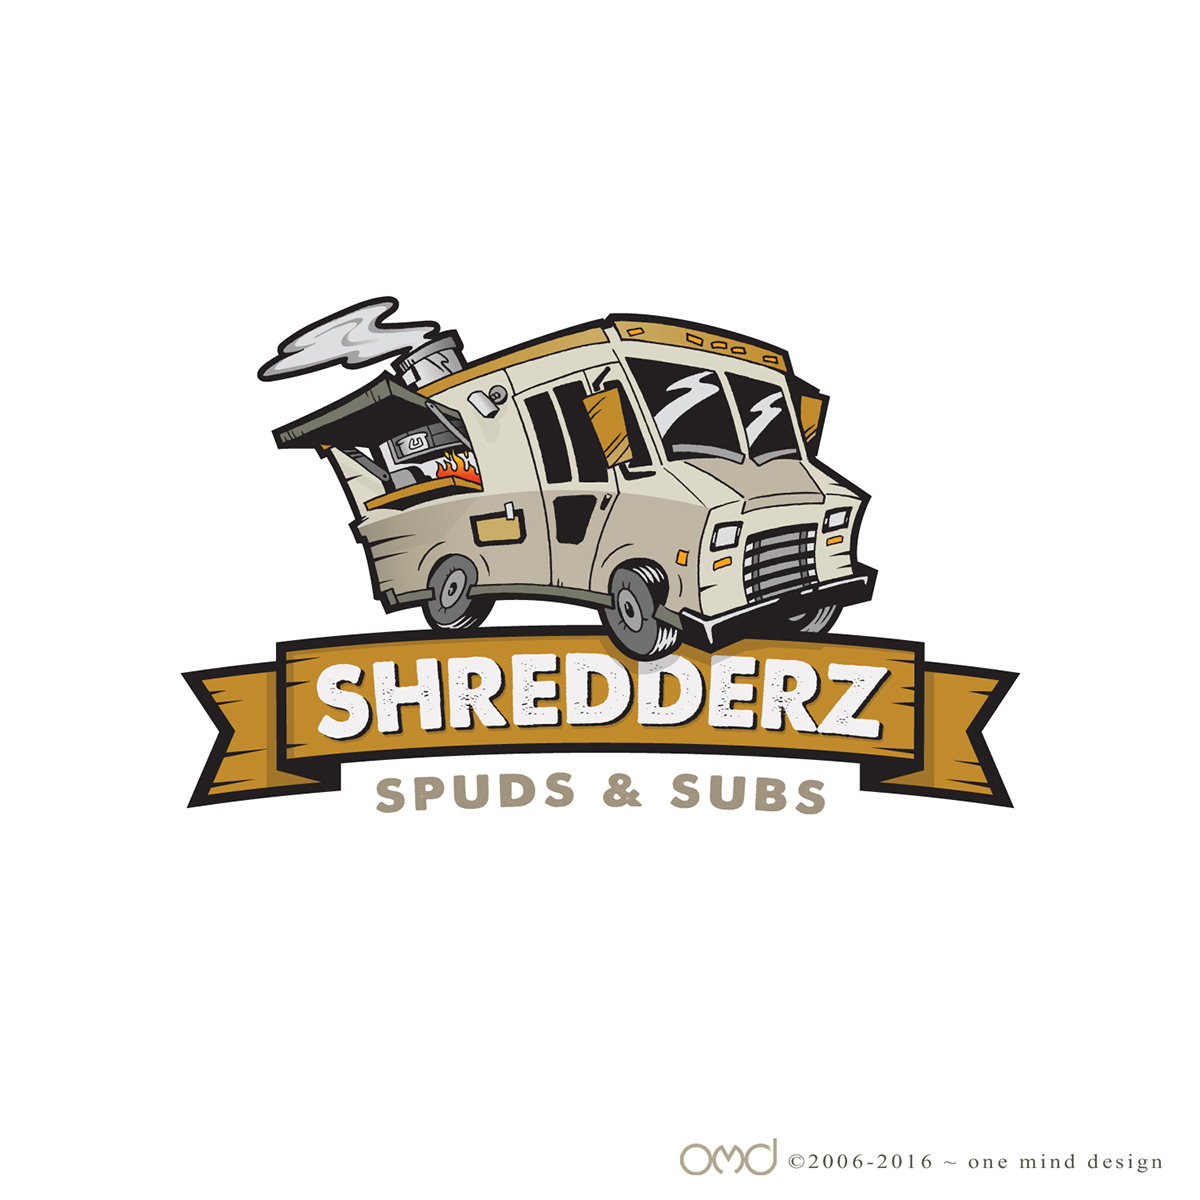 Shredderz food truck logo on behance for Food truck design app